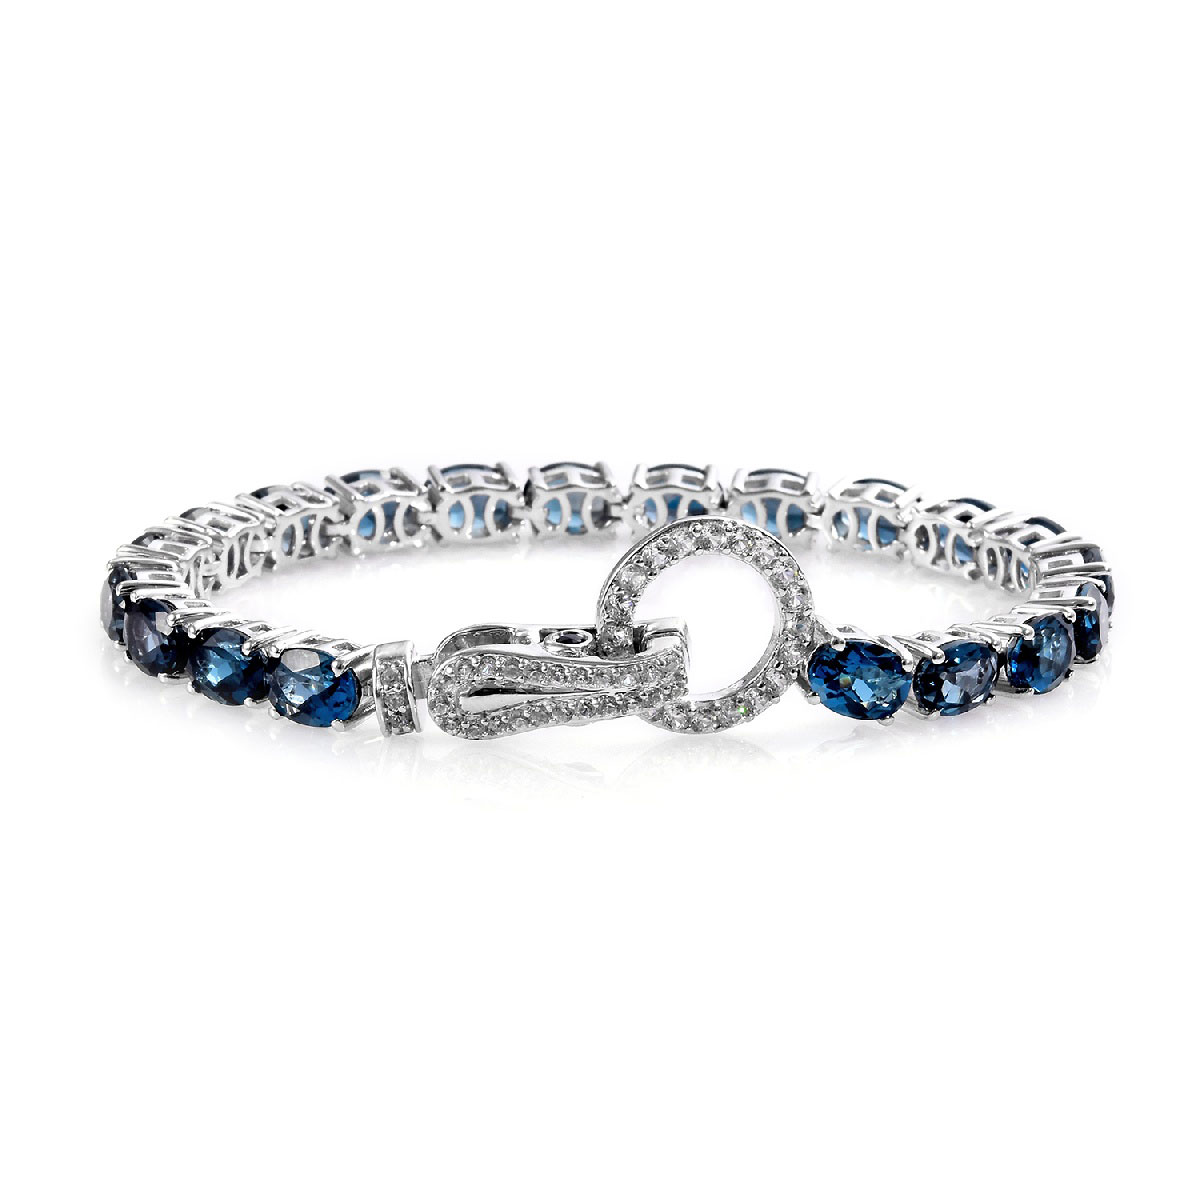 Blue Sapphire /& Diamond Tennis Bracelet Pear shape Sterling Silver Platinum over